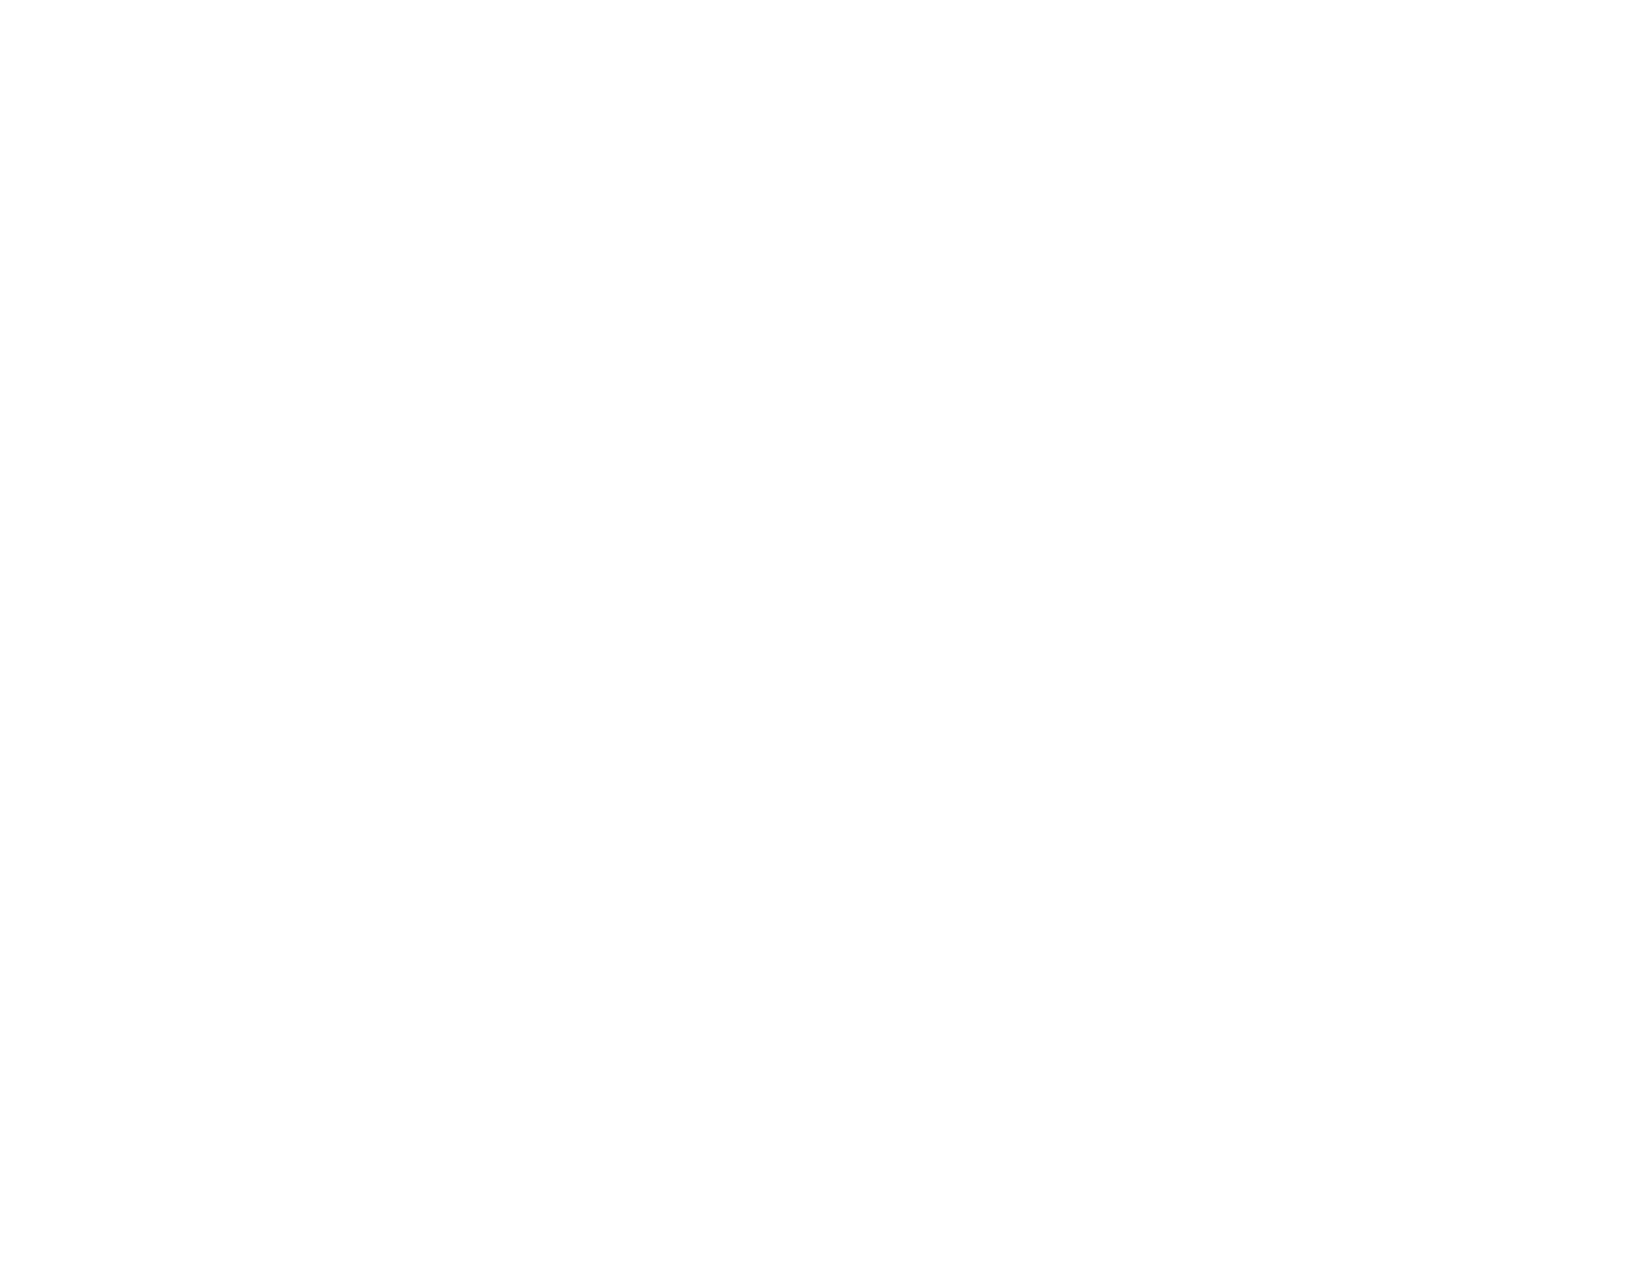 logo_PUCPR 60 anos_horizontal-02